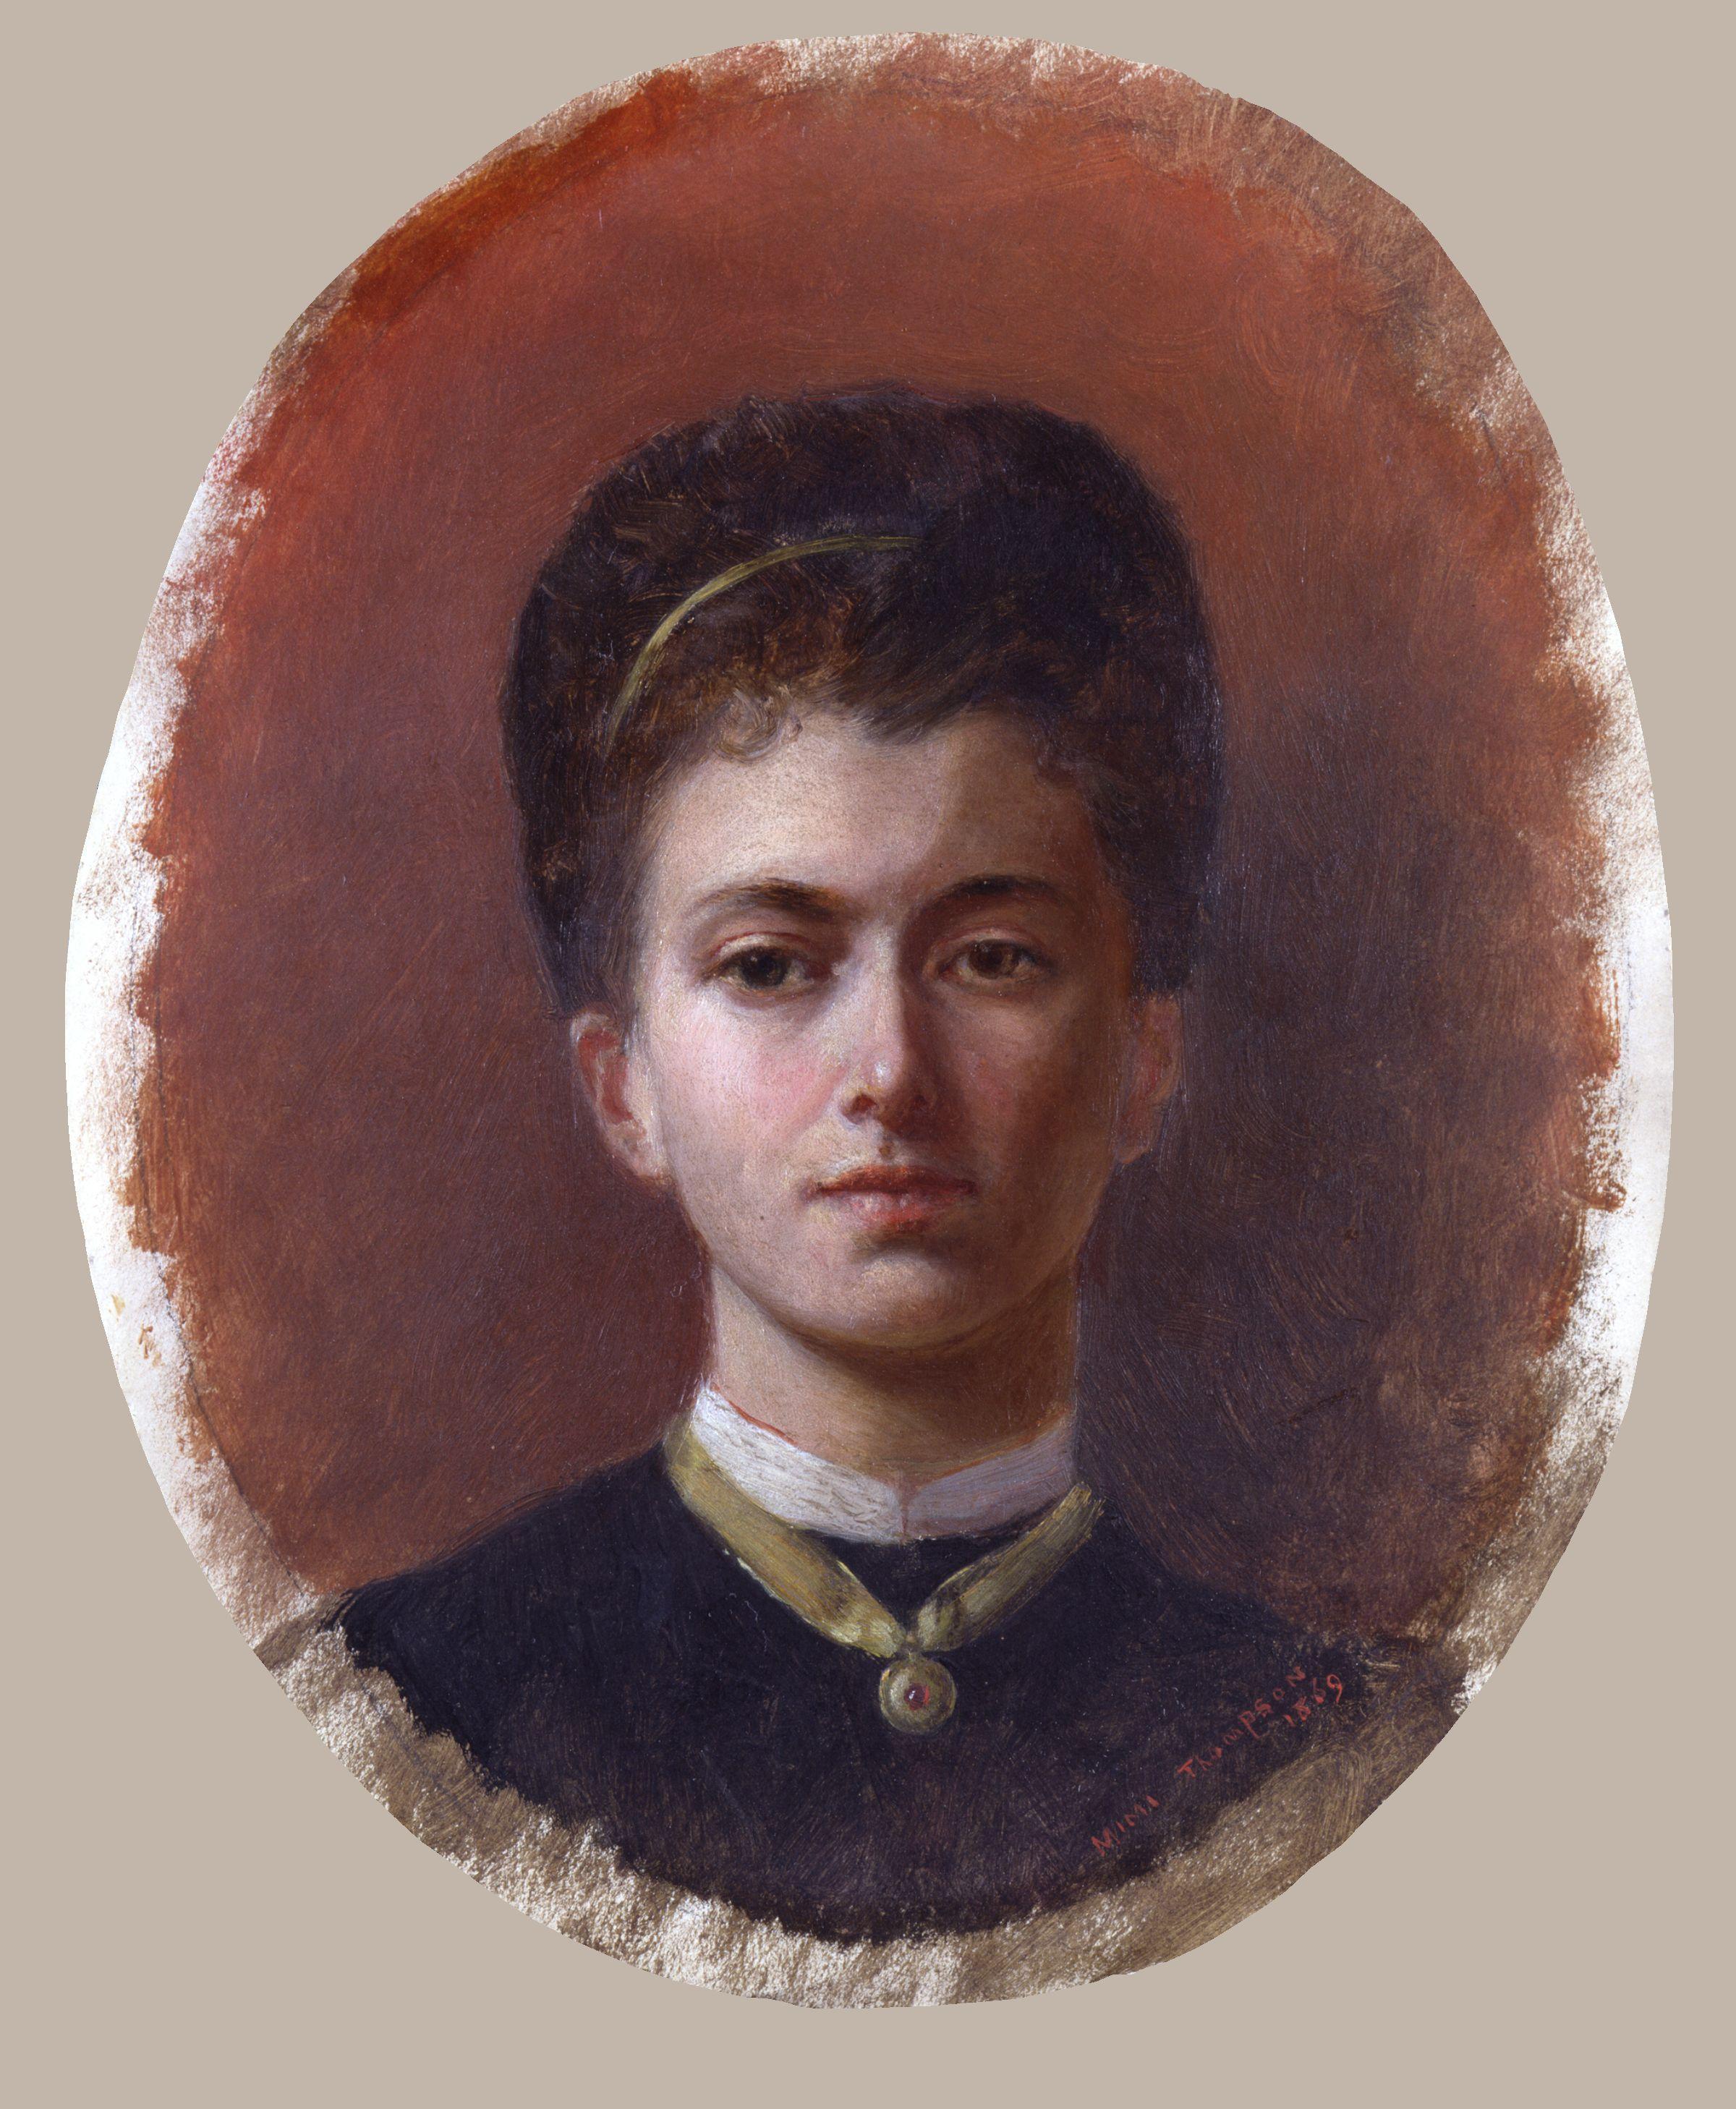 Self-portrait, 1869